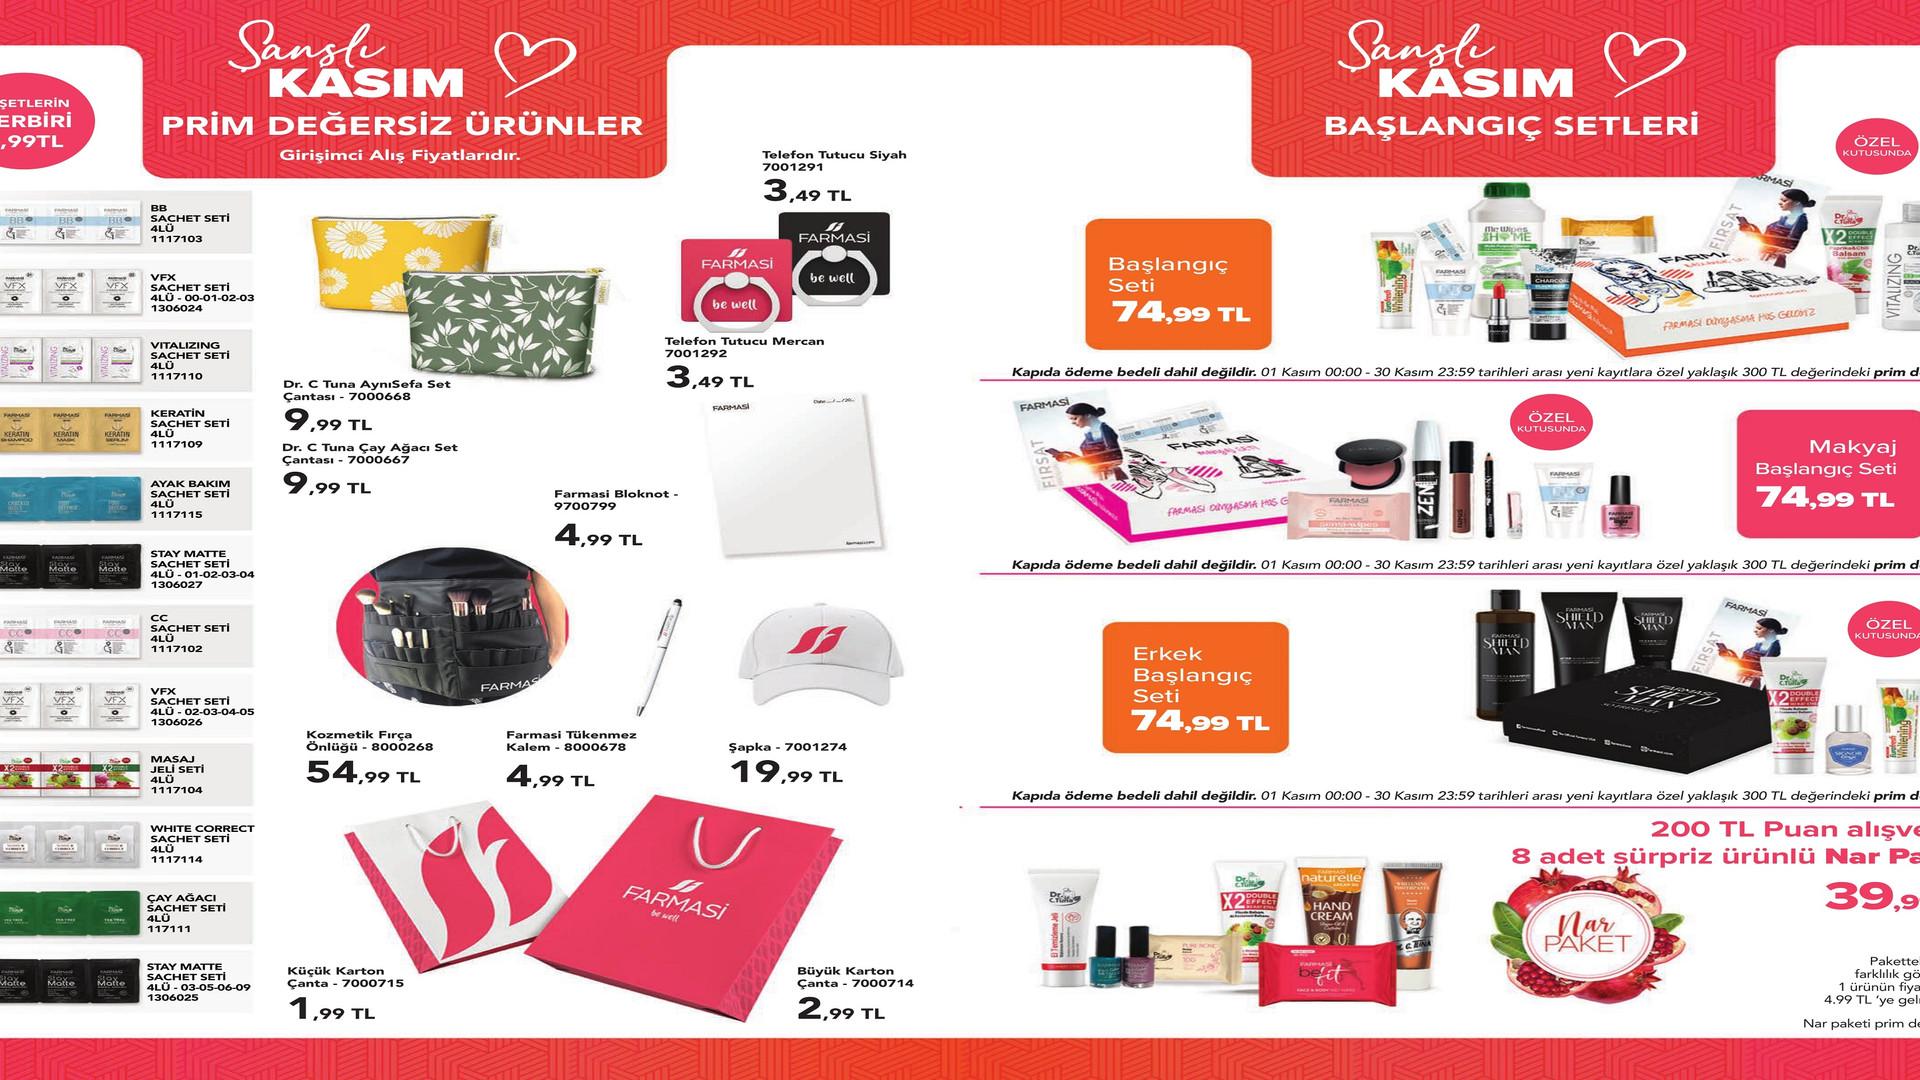 farmasi-kasim-sans-katalogu-2020 (15).jp